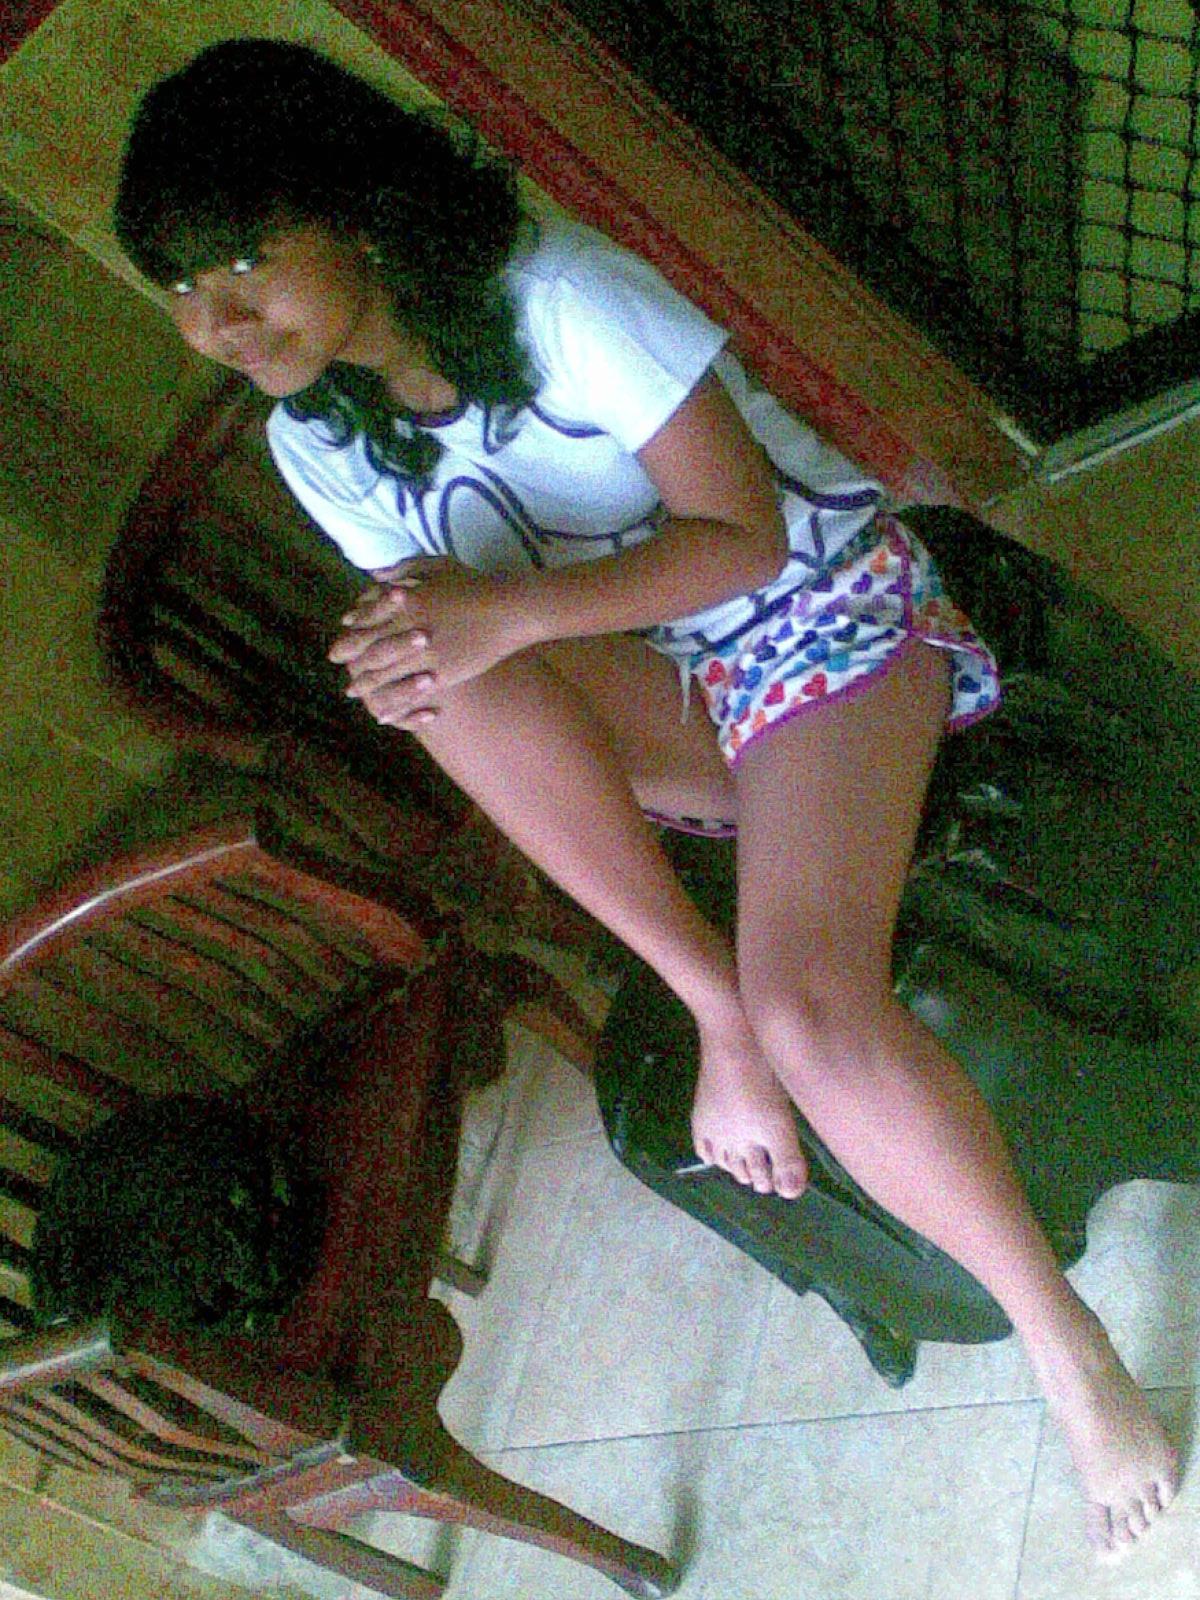 Foto Ngintip Cd Tante | Anak ABG Cantik